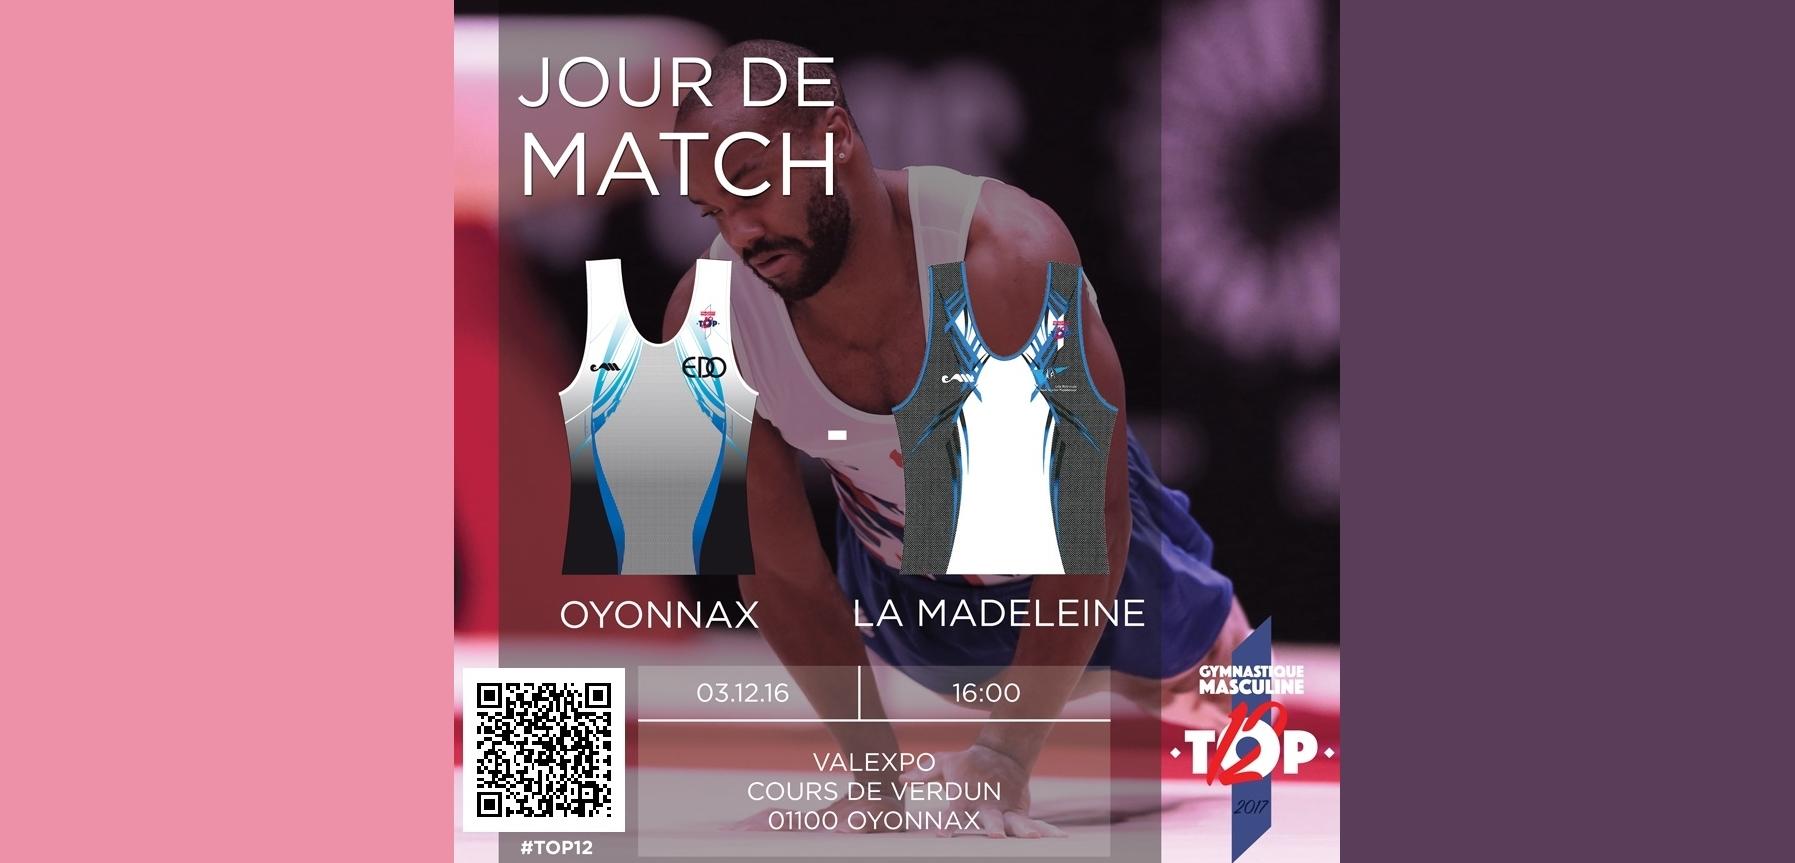 3 eme match TOP 12 pour Oyonnax